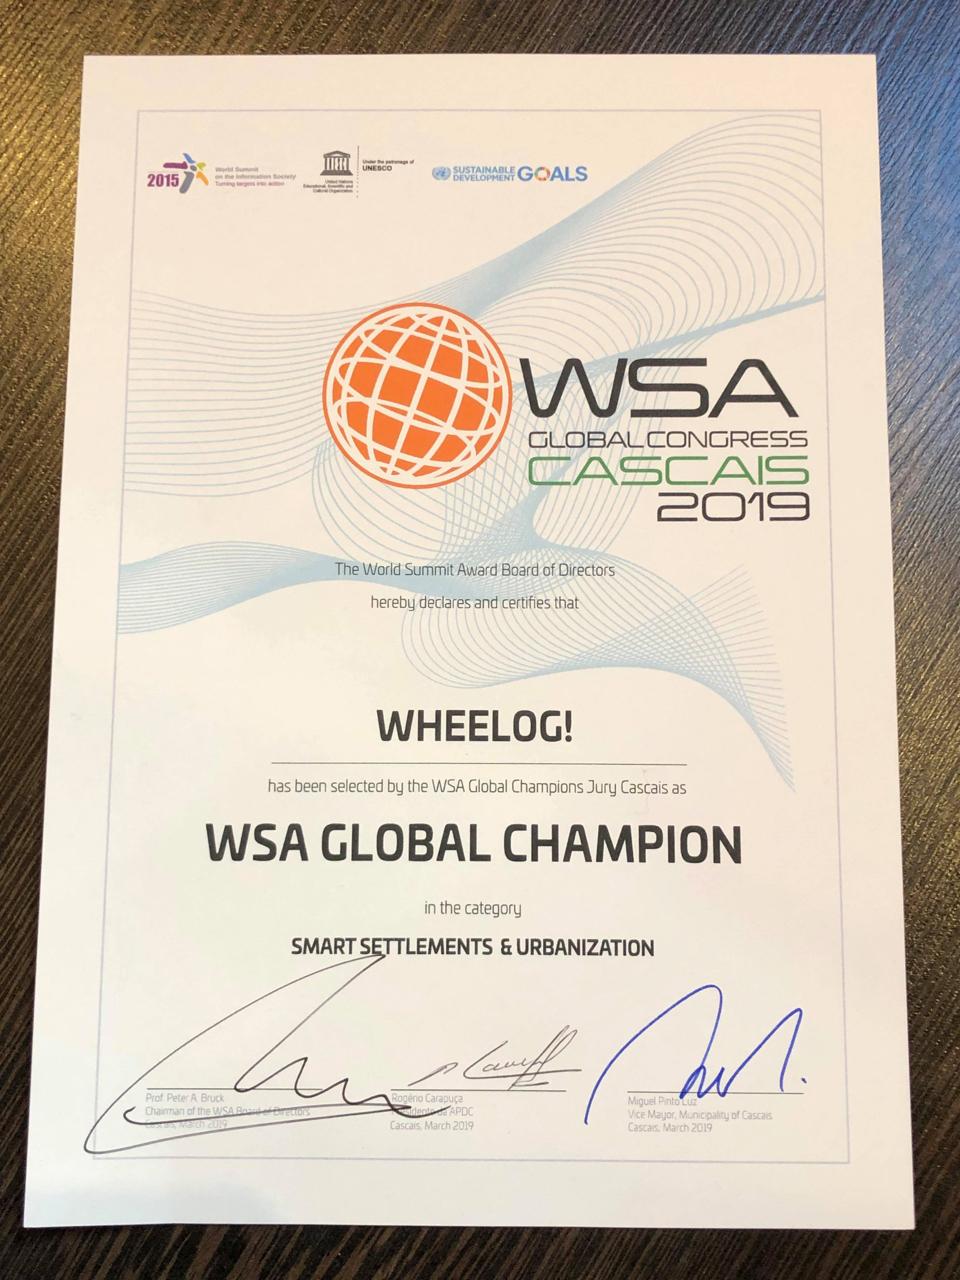 WSA GLOBAL CHAMPION